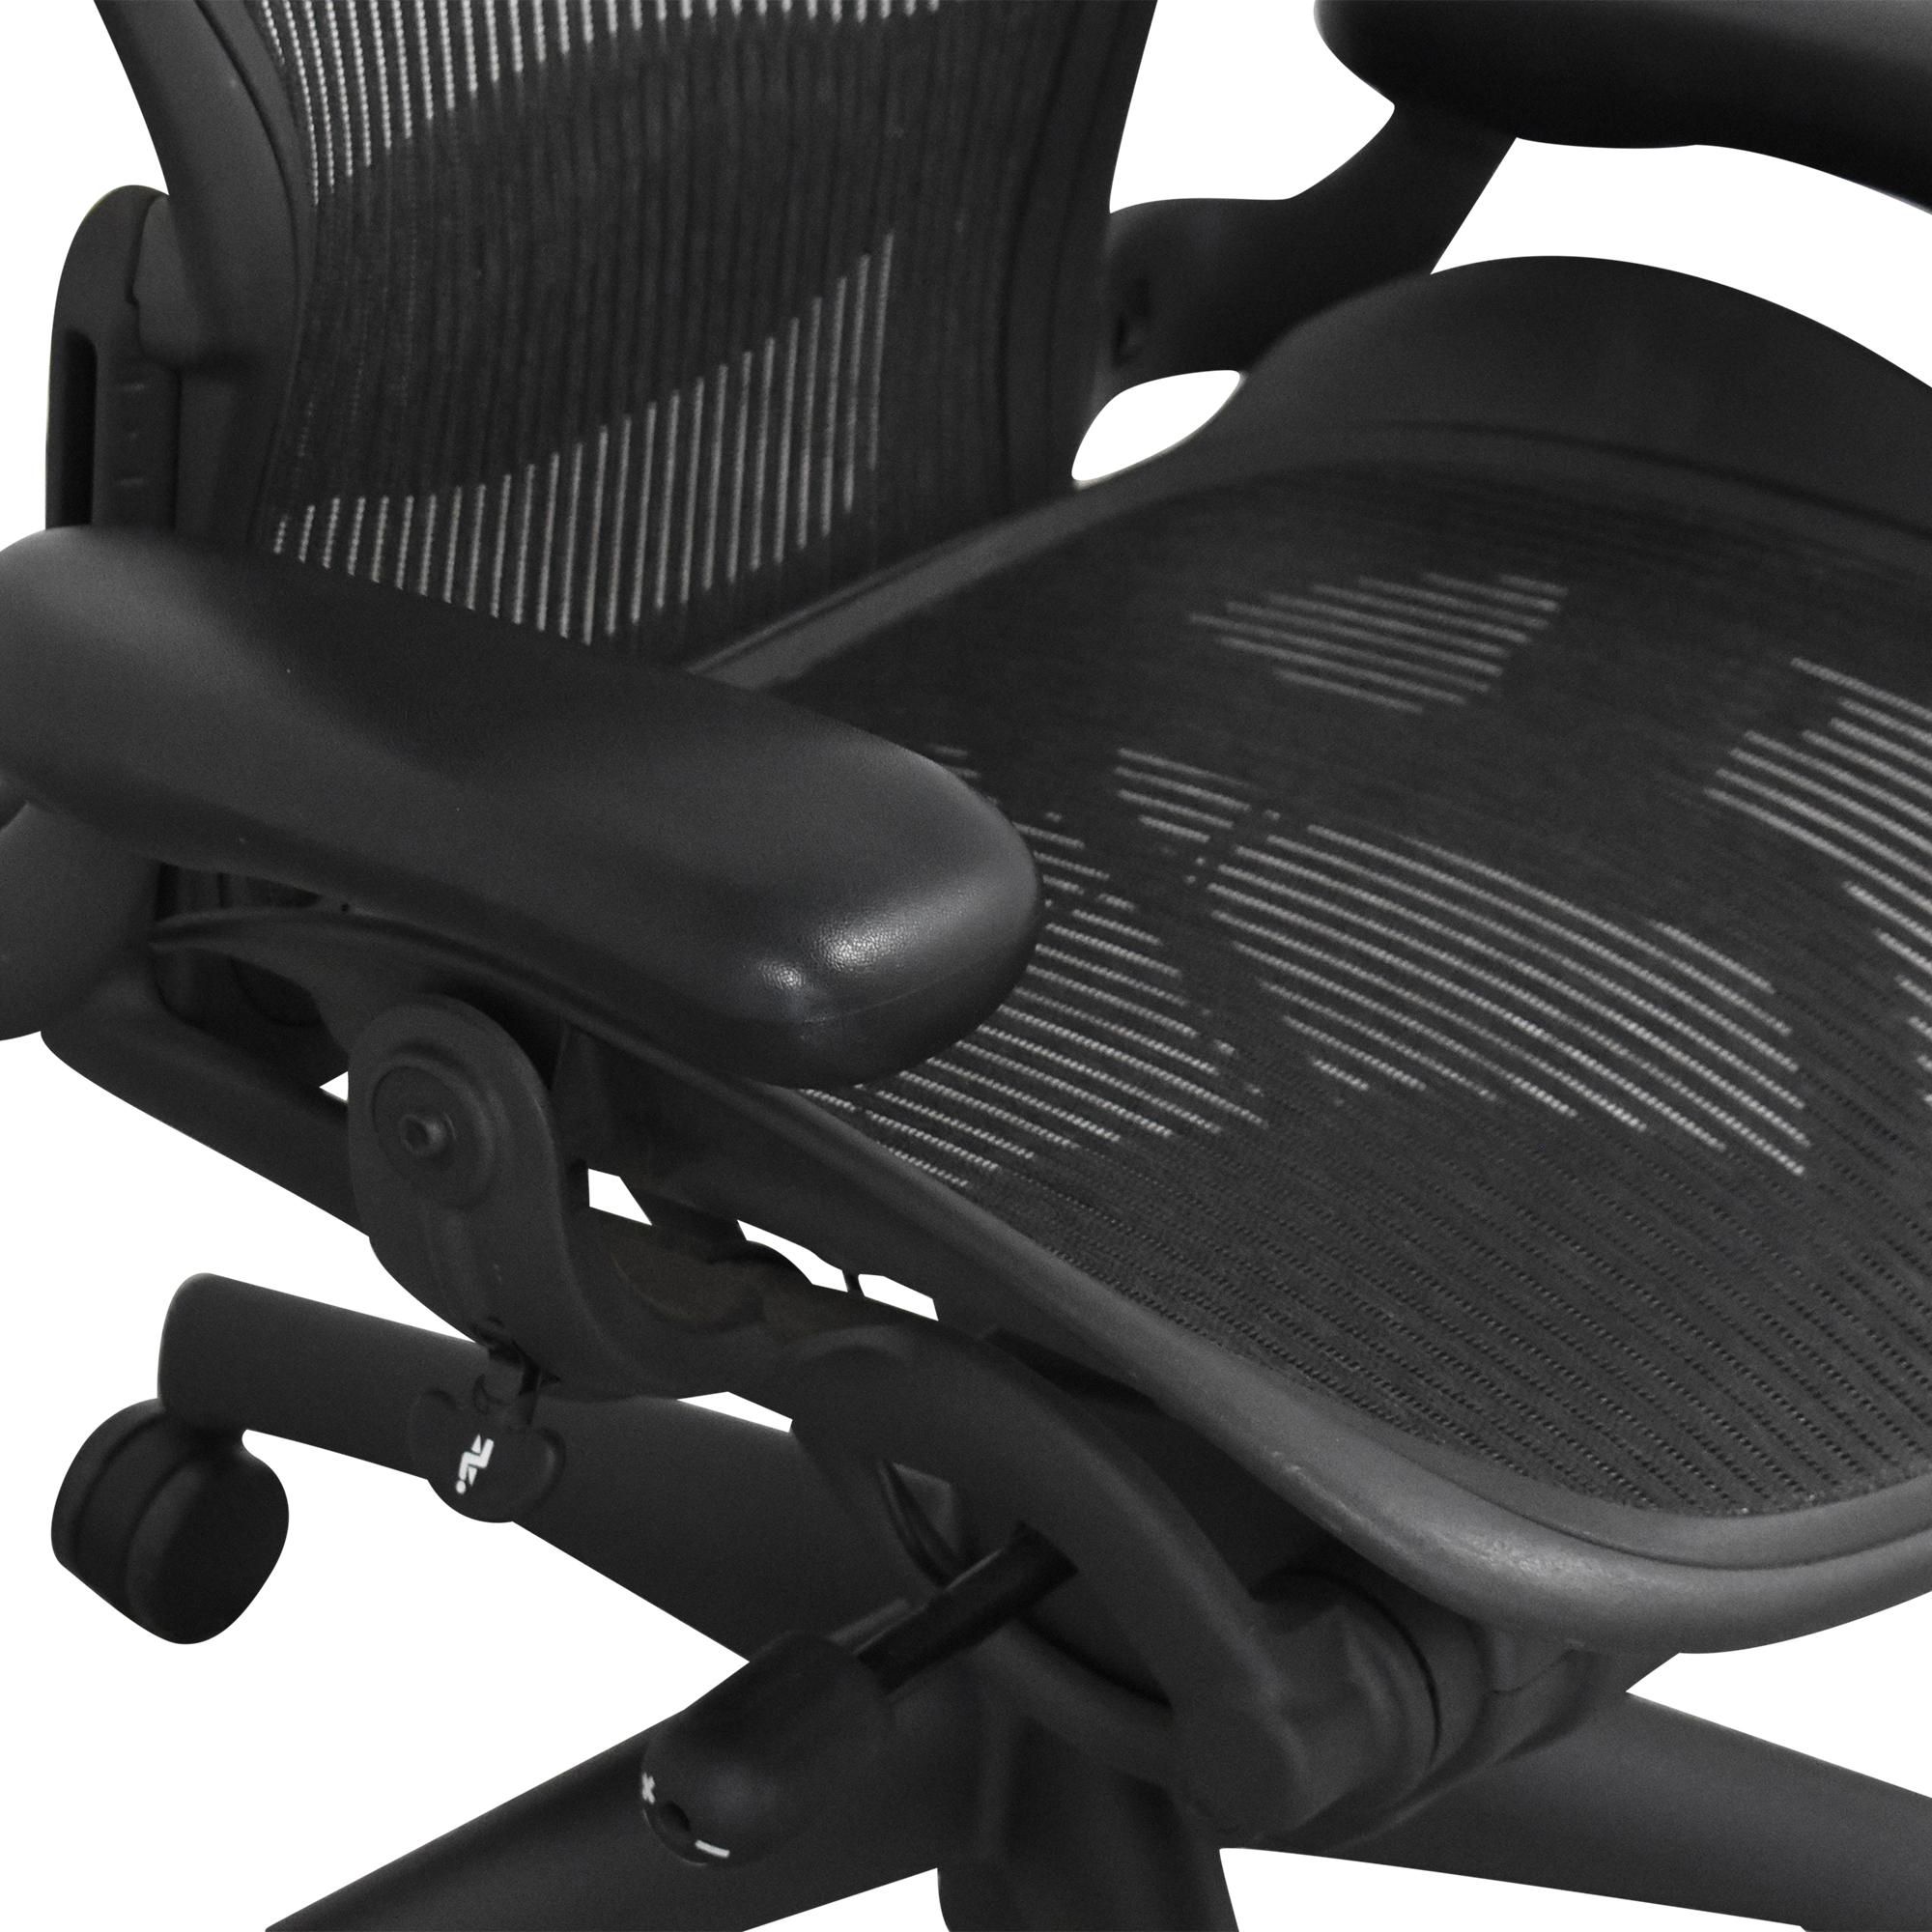 Herman Miller Herman Miller Aeron Size B Swivel Desk Chair used